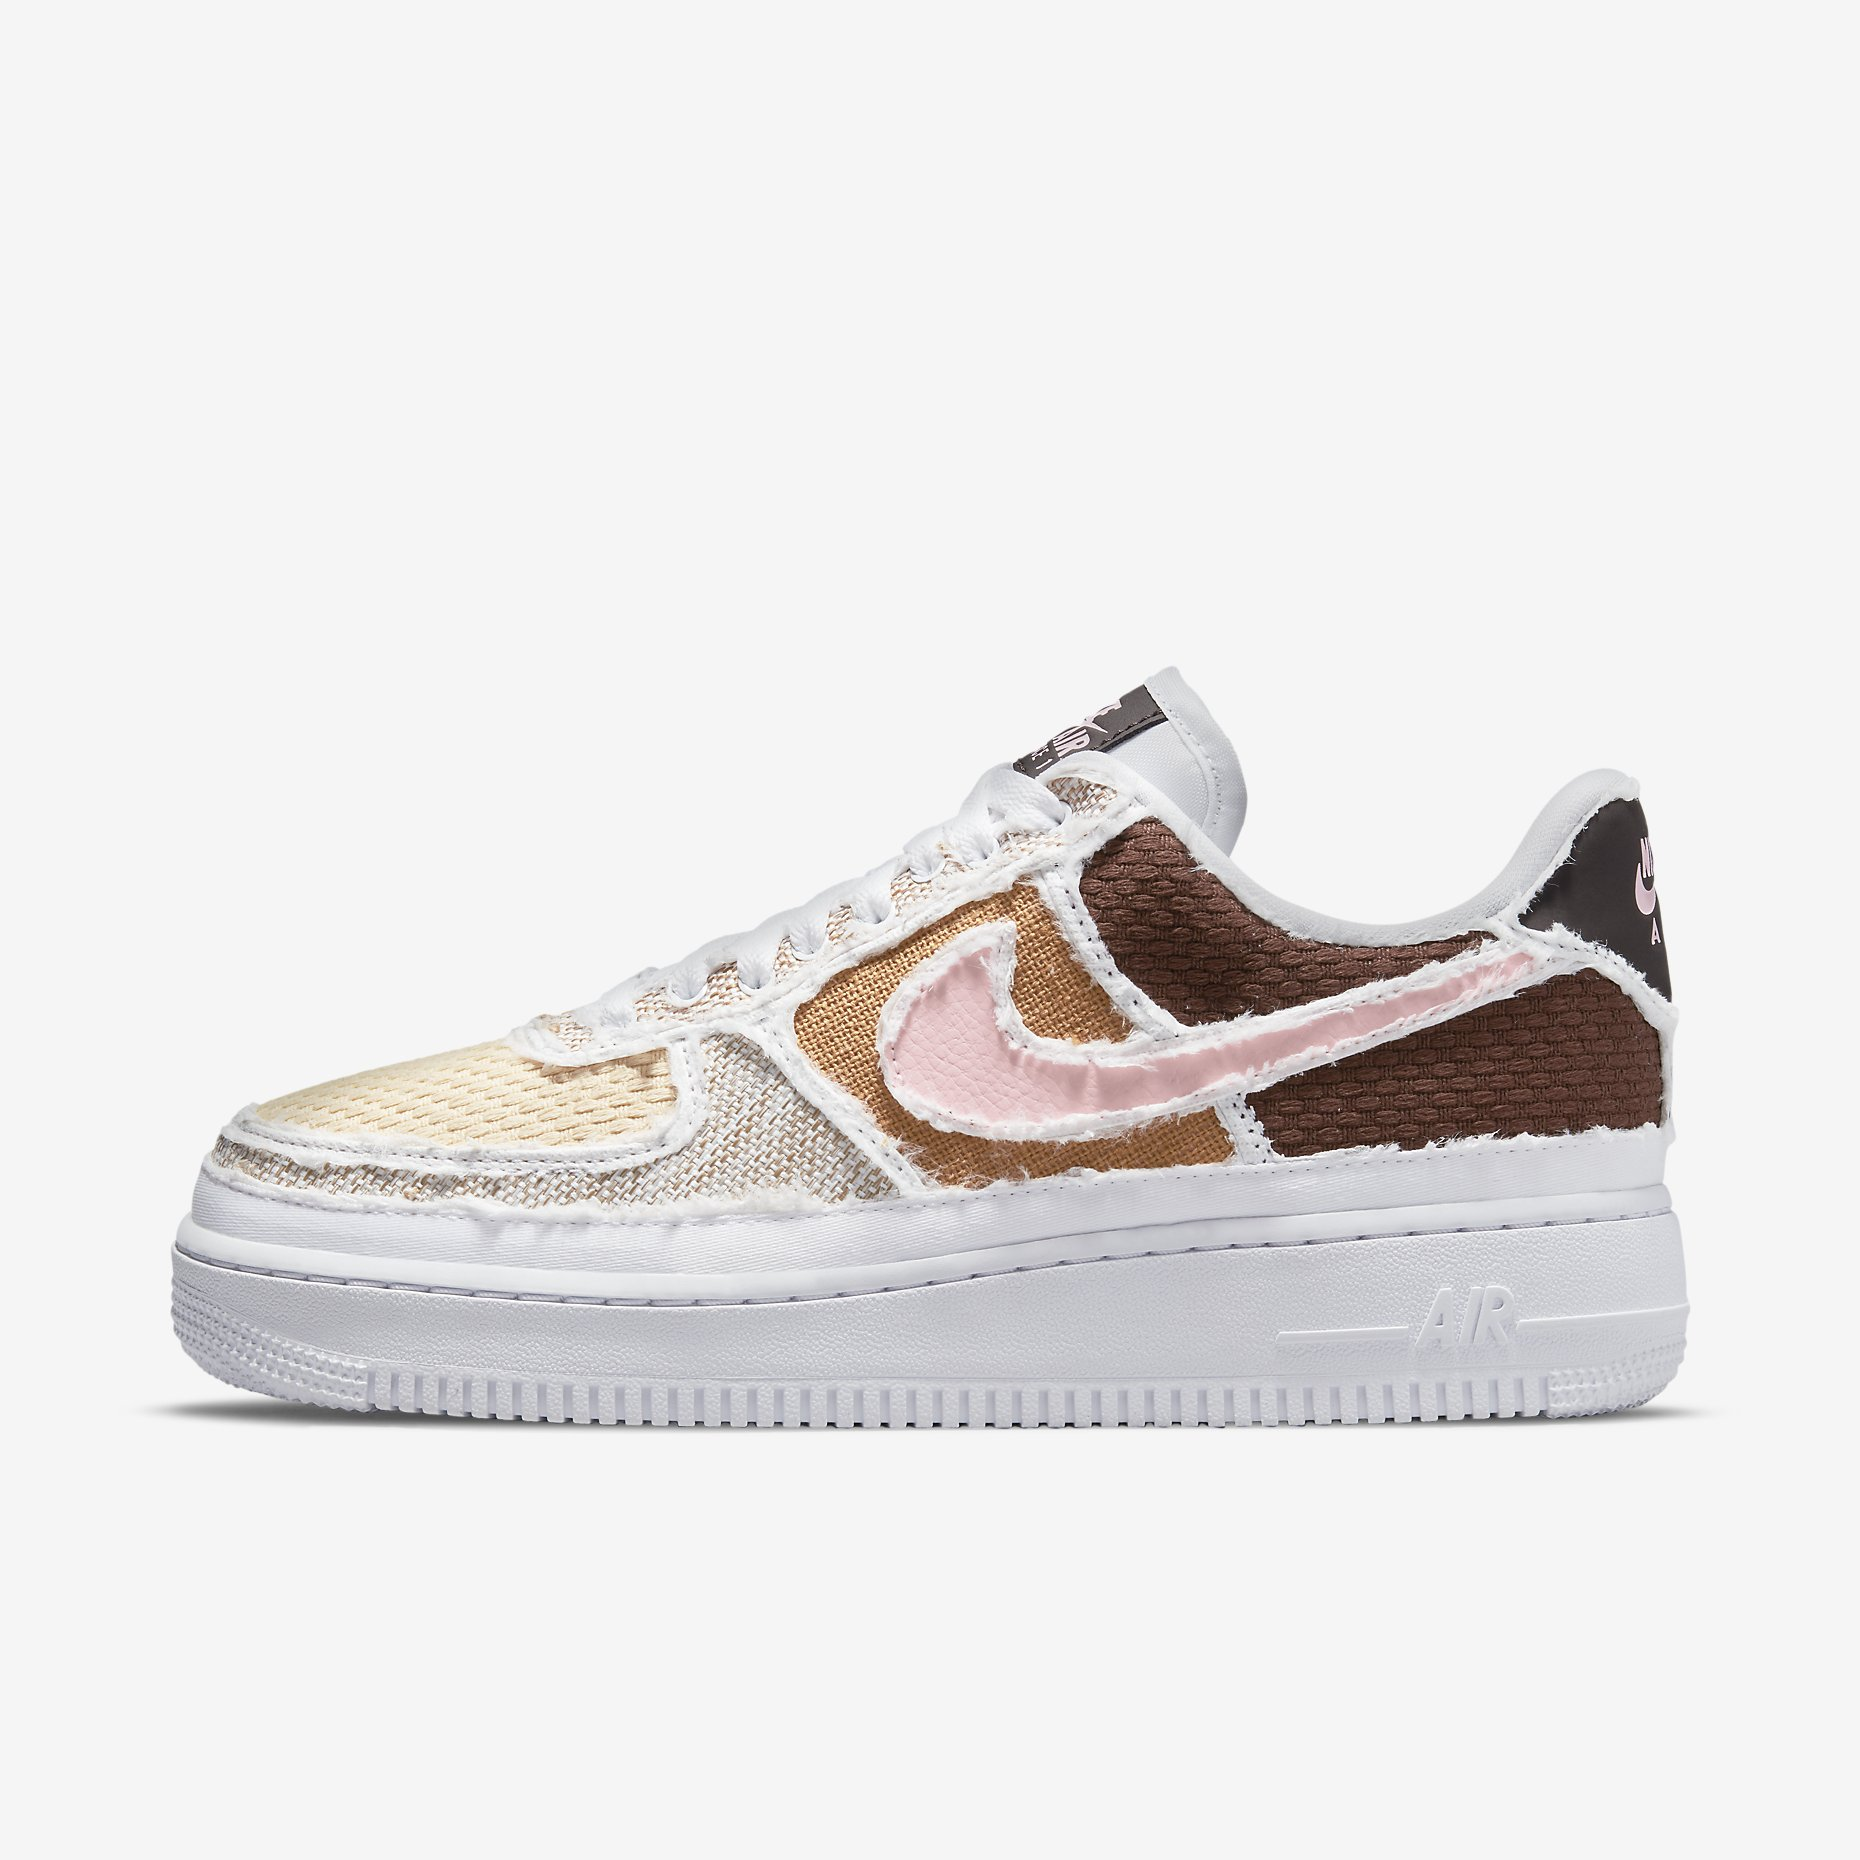 Women's Nike Air Force 1 '07 PRM 'Fauna Brown' - 'Texture Reveal'}